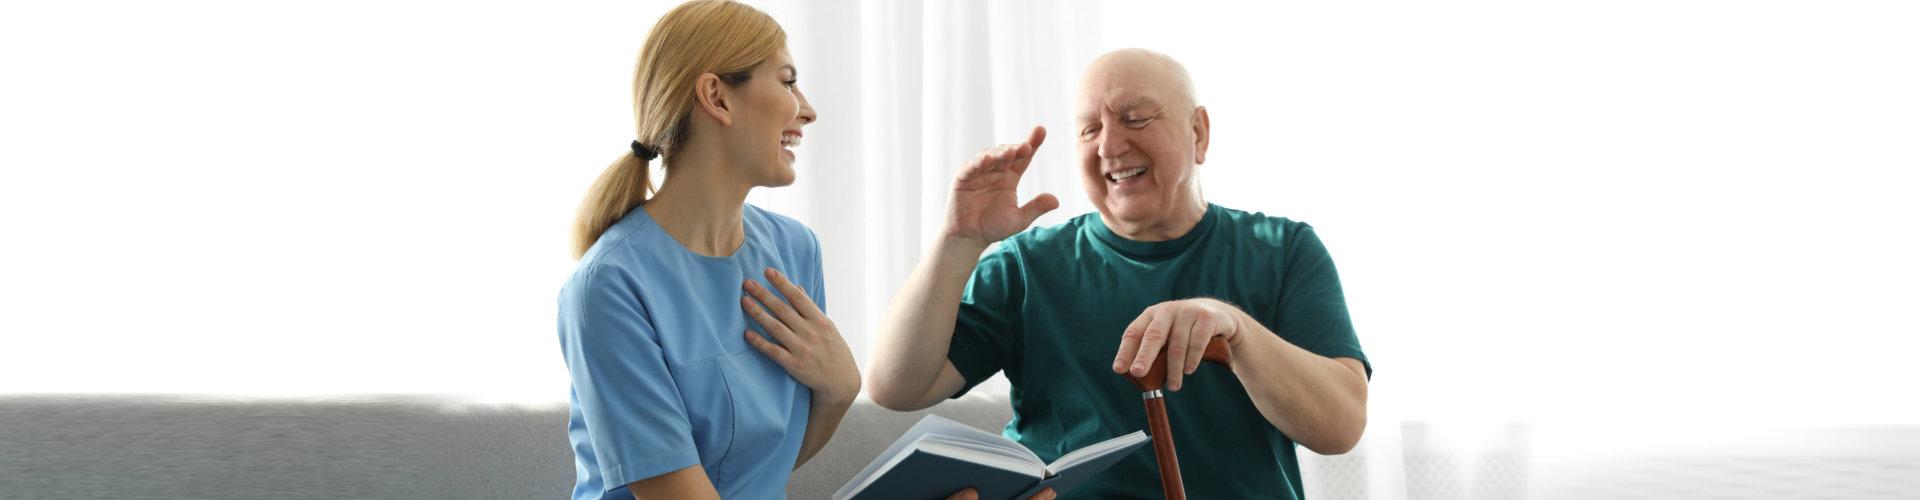 Nurse reading book to elderly man indoors. Assisting senior people